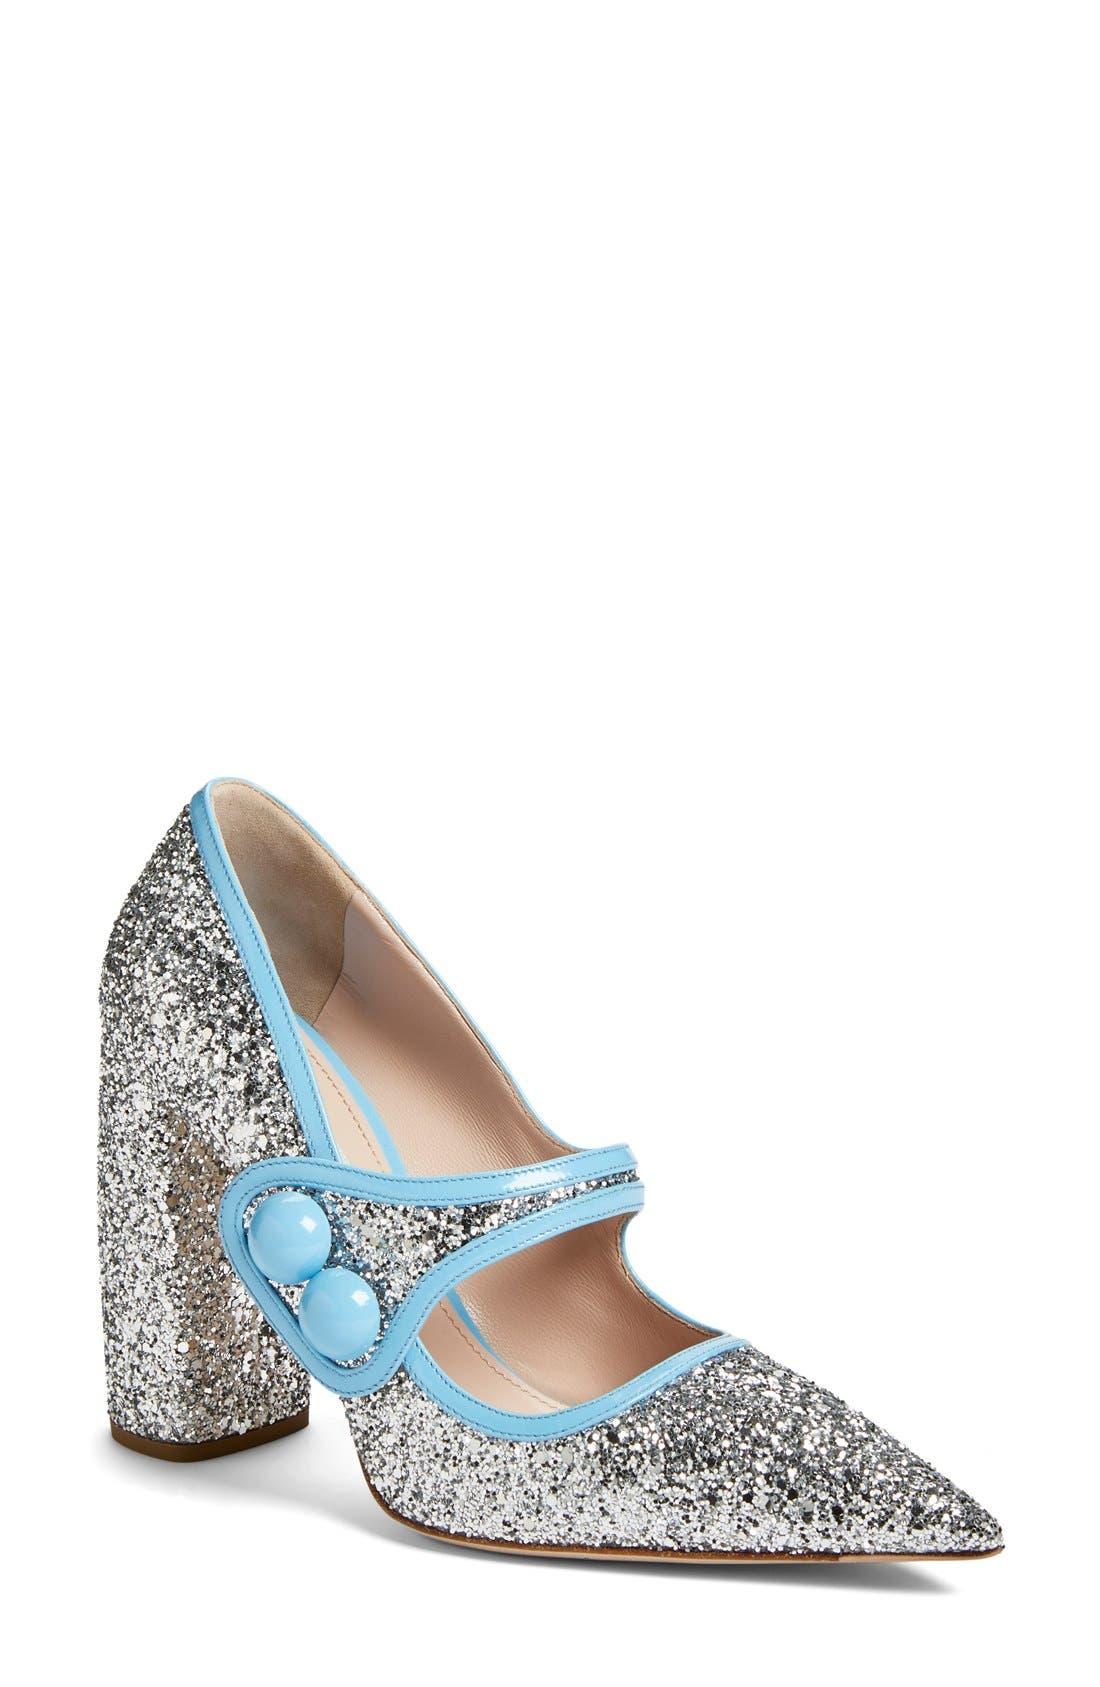 MIU MIU Glitter Mary Jane, Main, color, 040